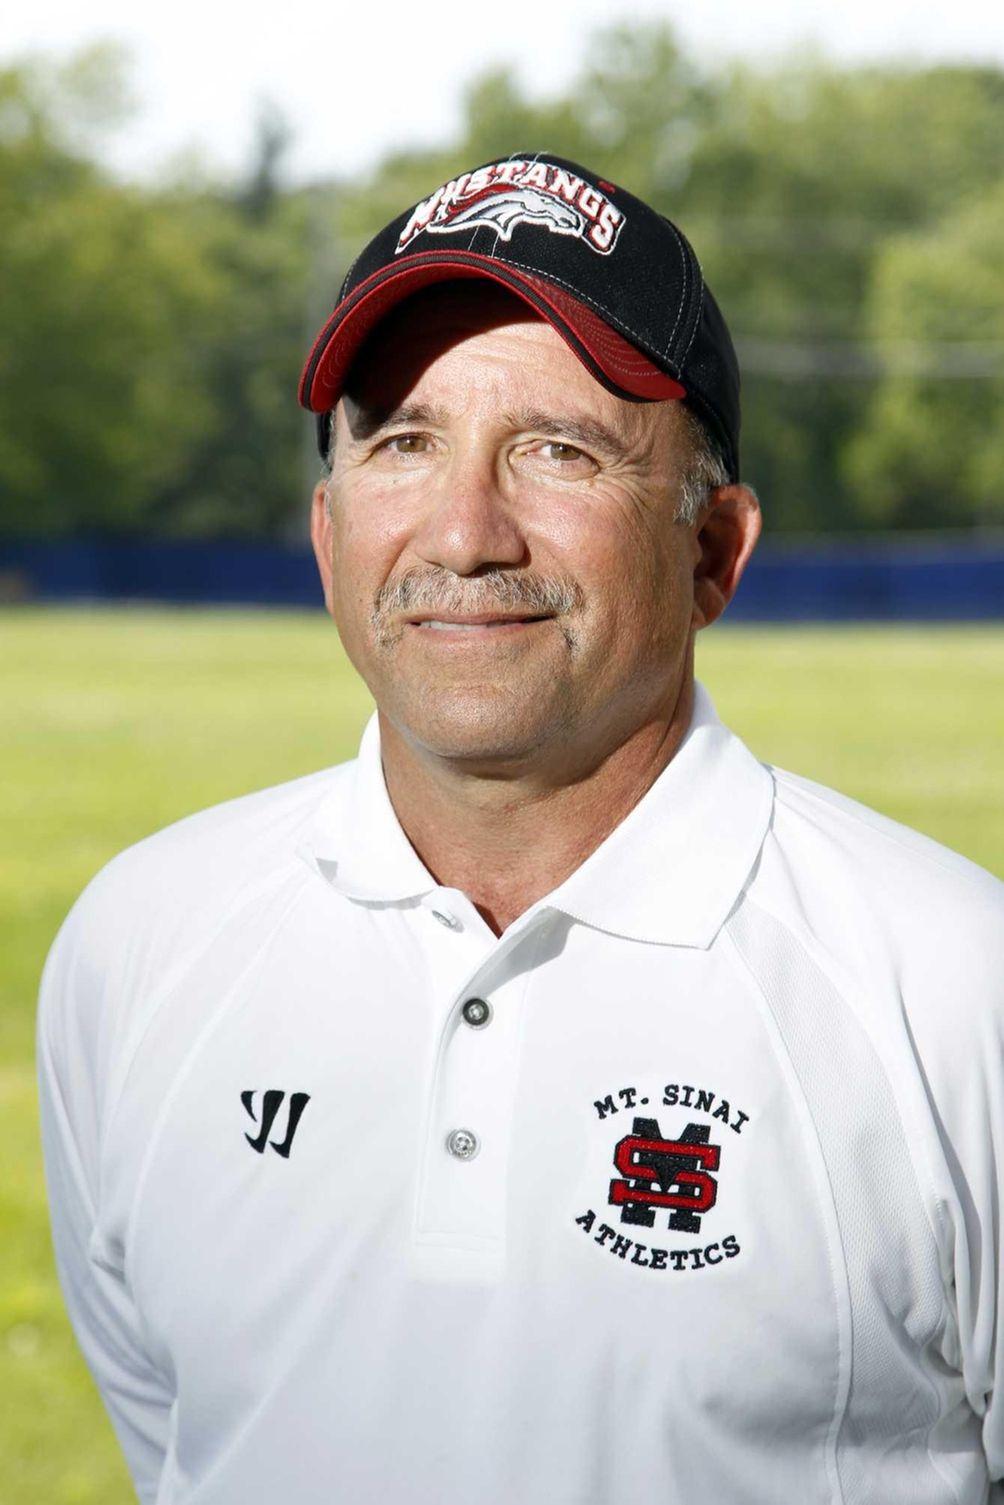 AL BERTOLONE, Suffolk Coach of the Year Mount